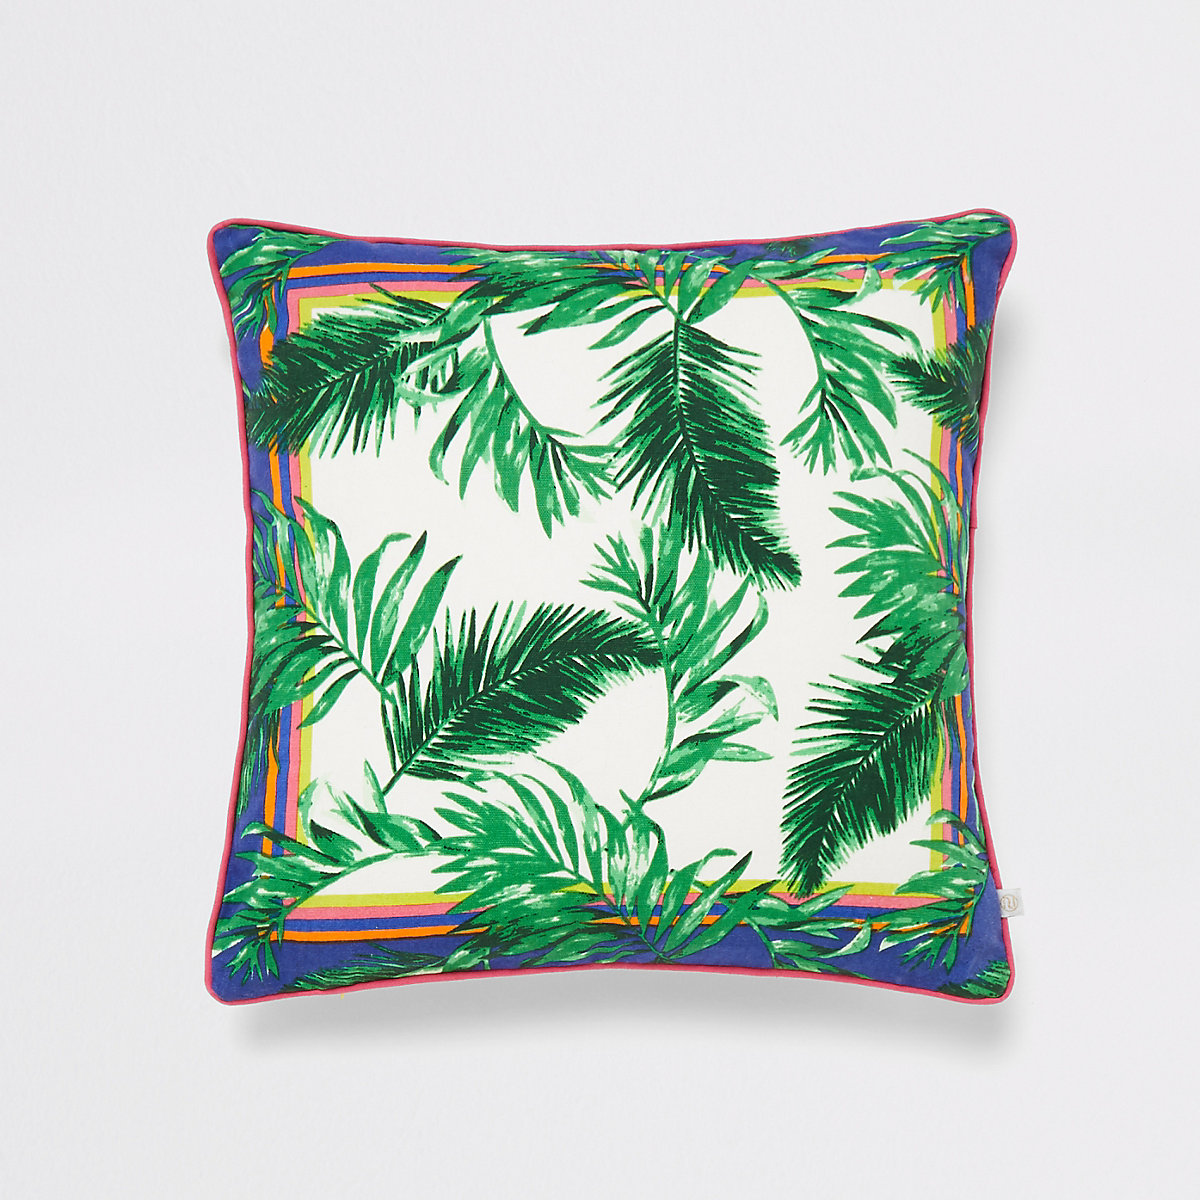 Green jungle print cushion